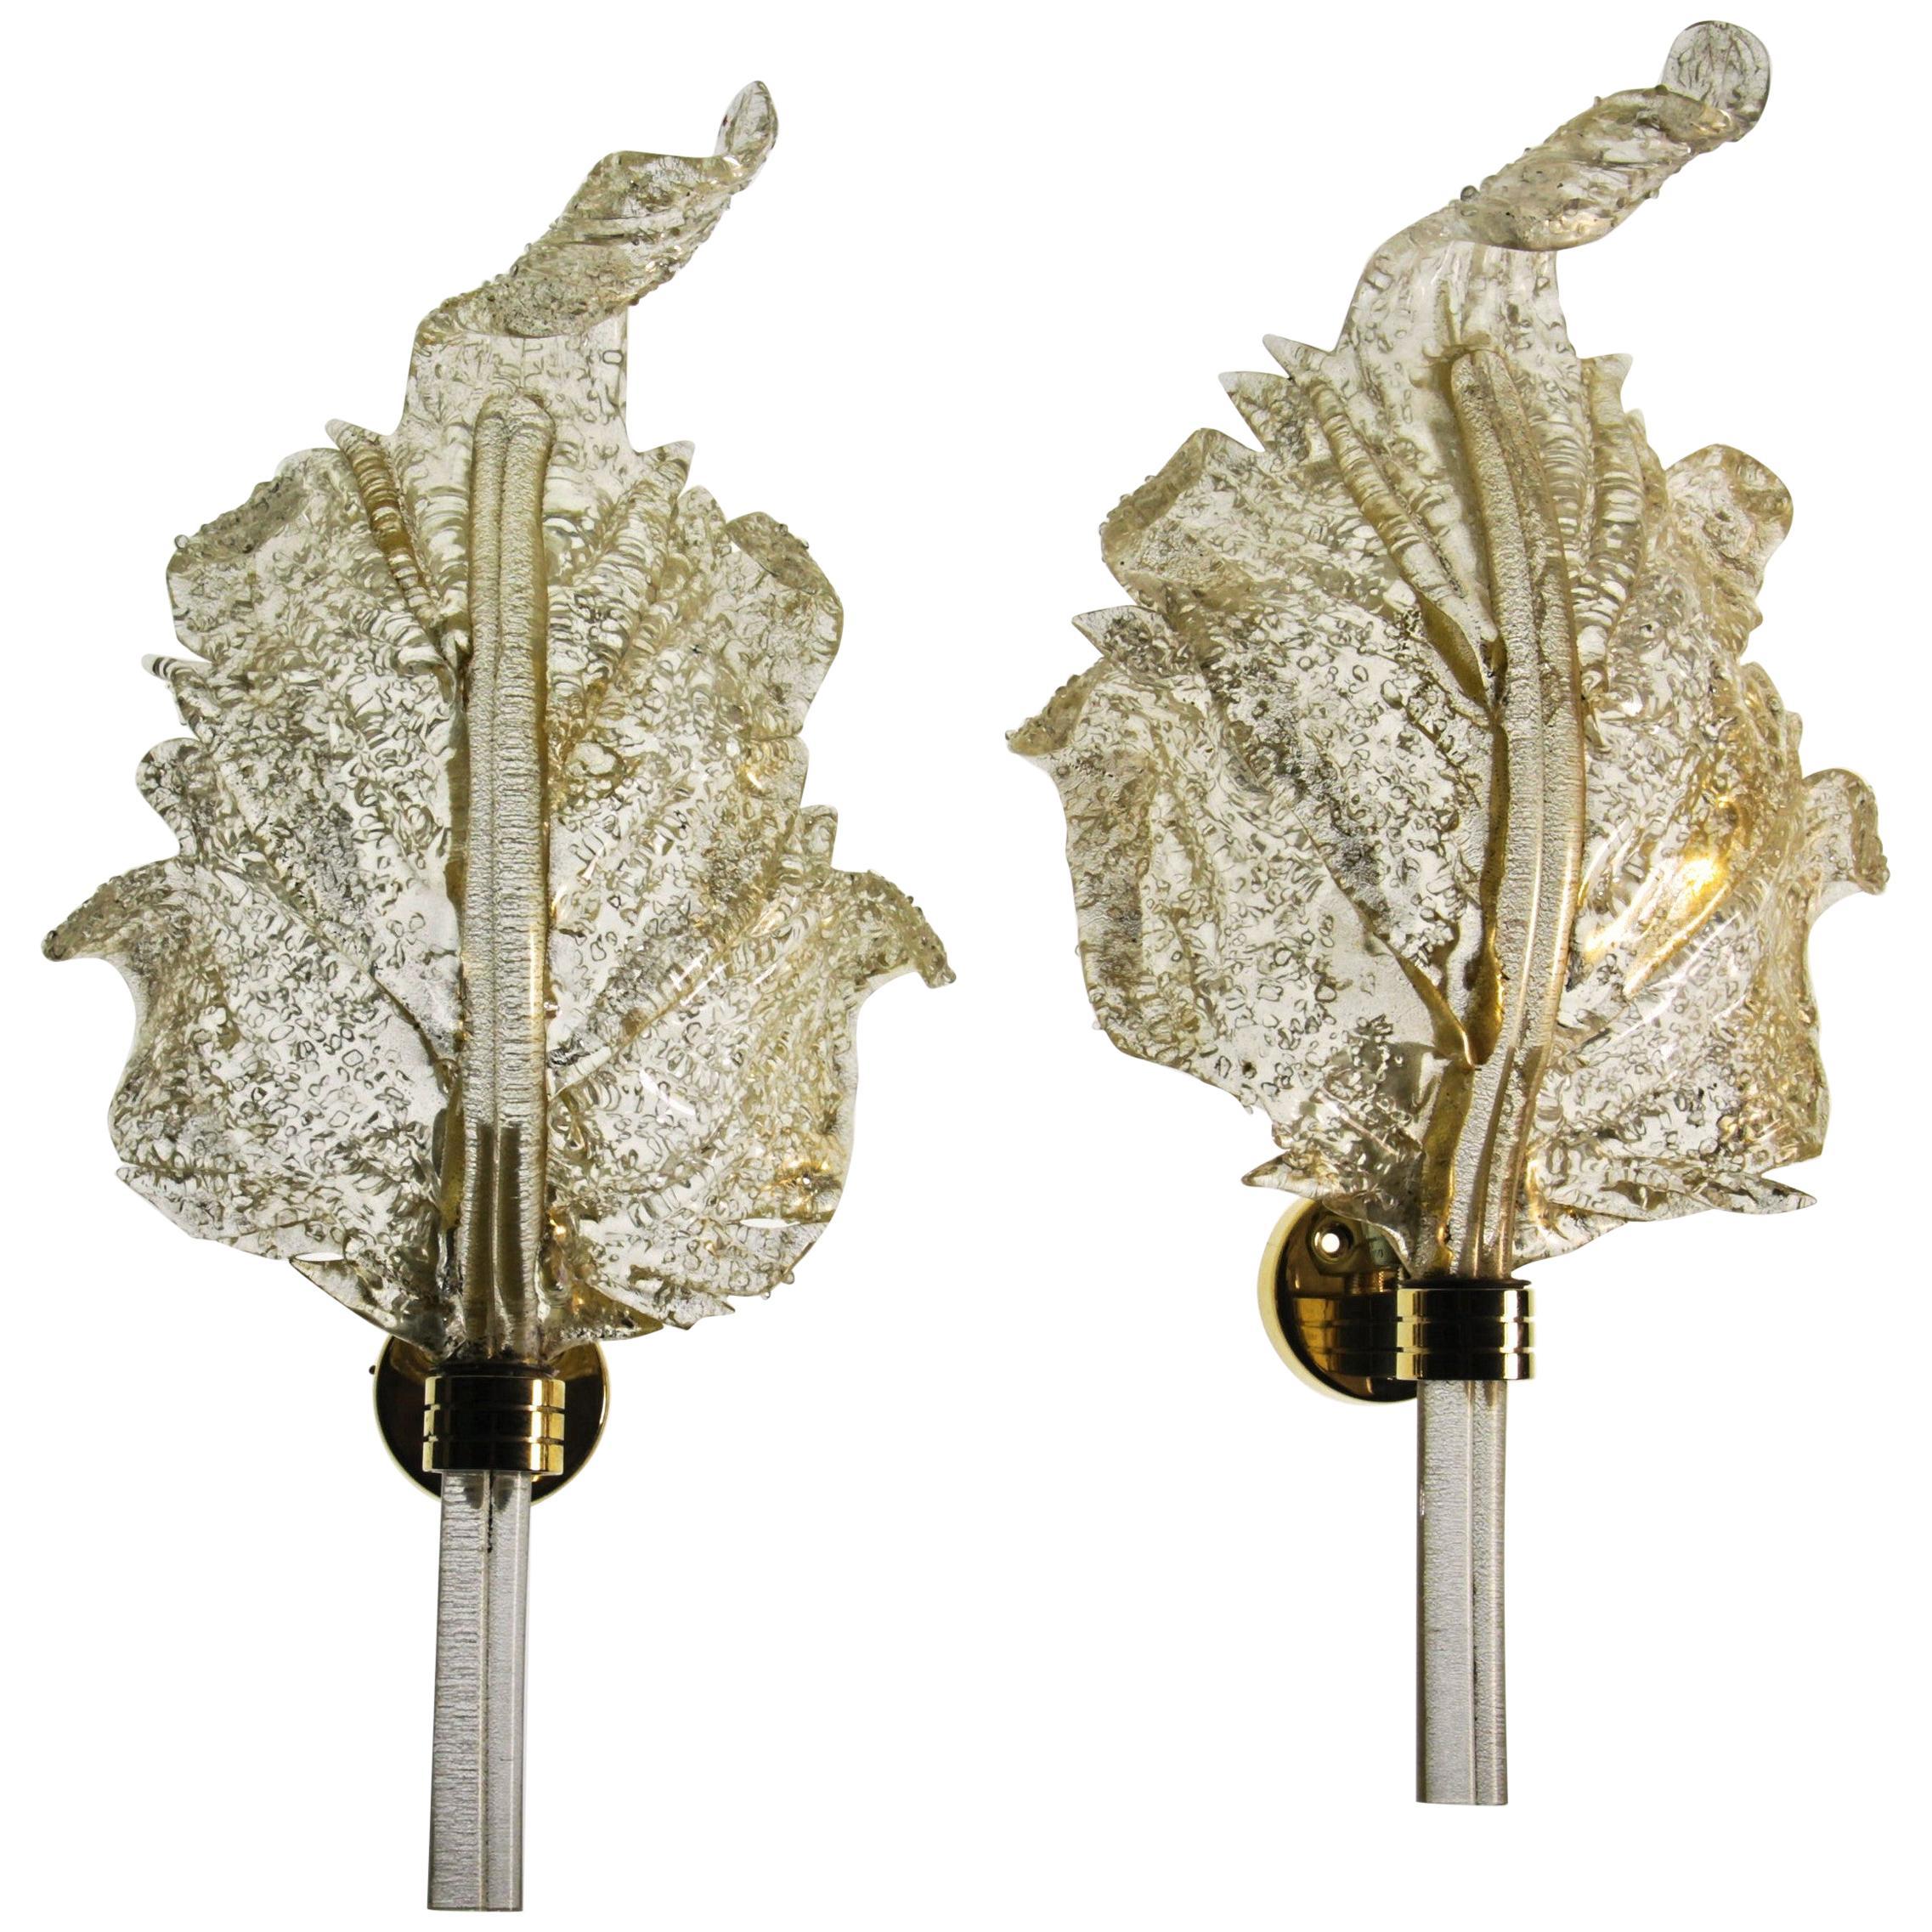 Barovier & Toso, Pair of Sconces Gold leaf, Rugiadoso Murano Glass, rigadin stem